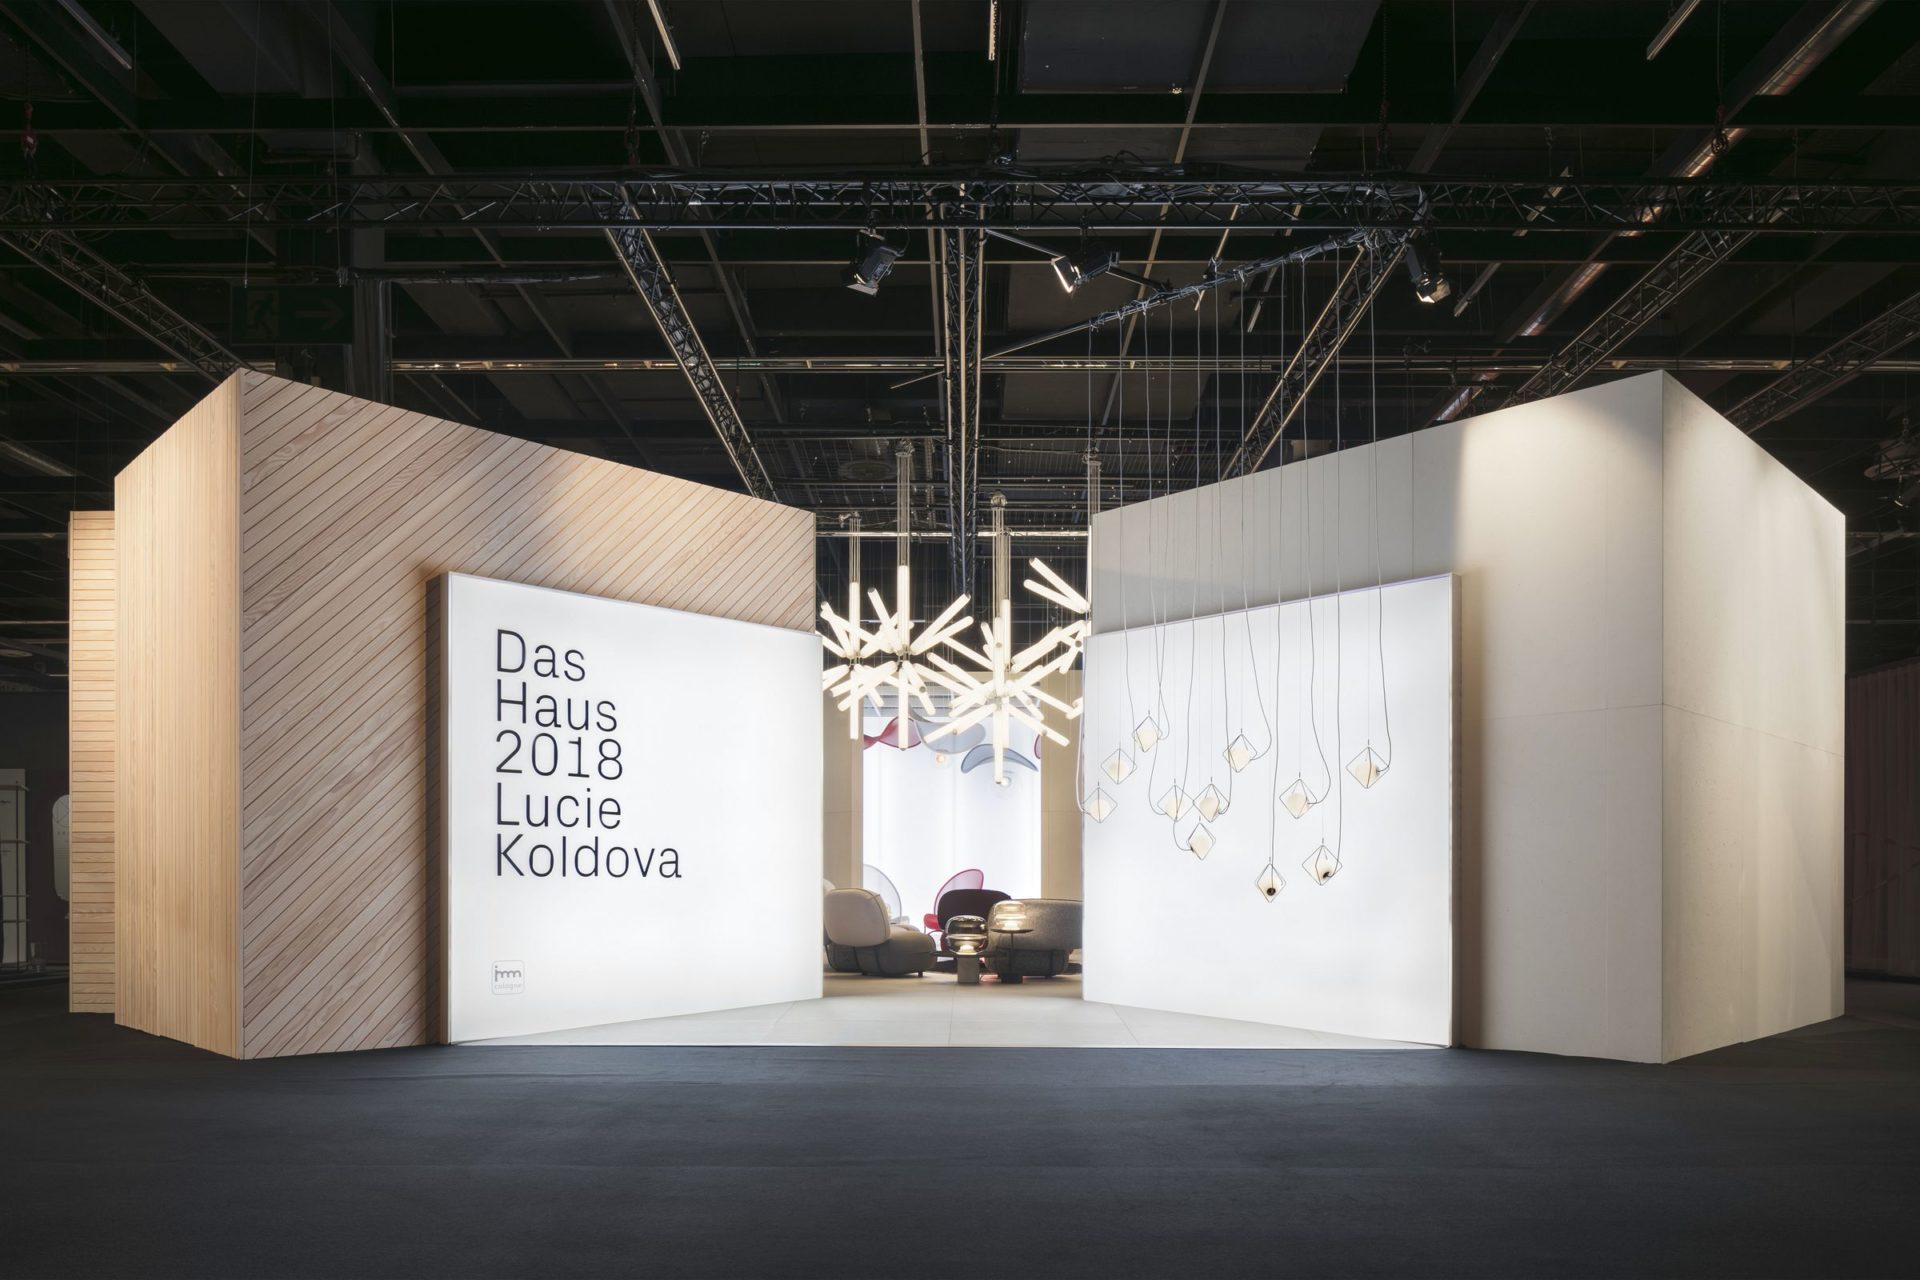 Das Haus 2018 Lucie Koldova, Halle 2.2, Pure Edition | Imm Cologne 2018